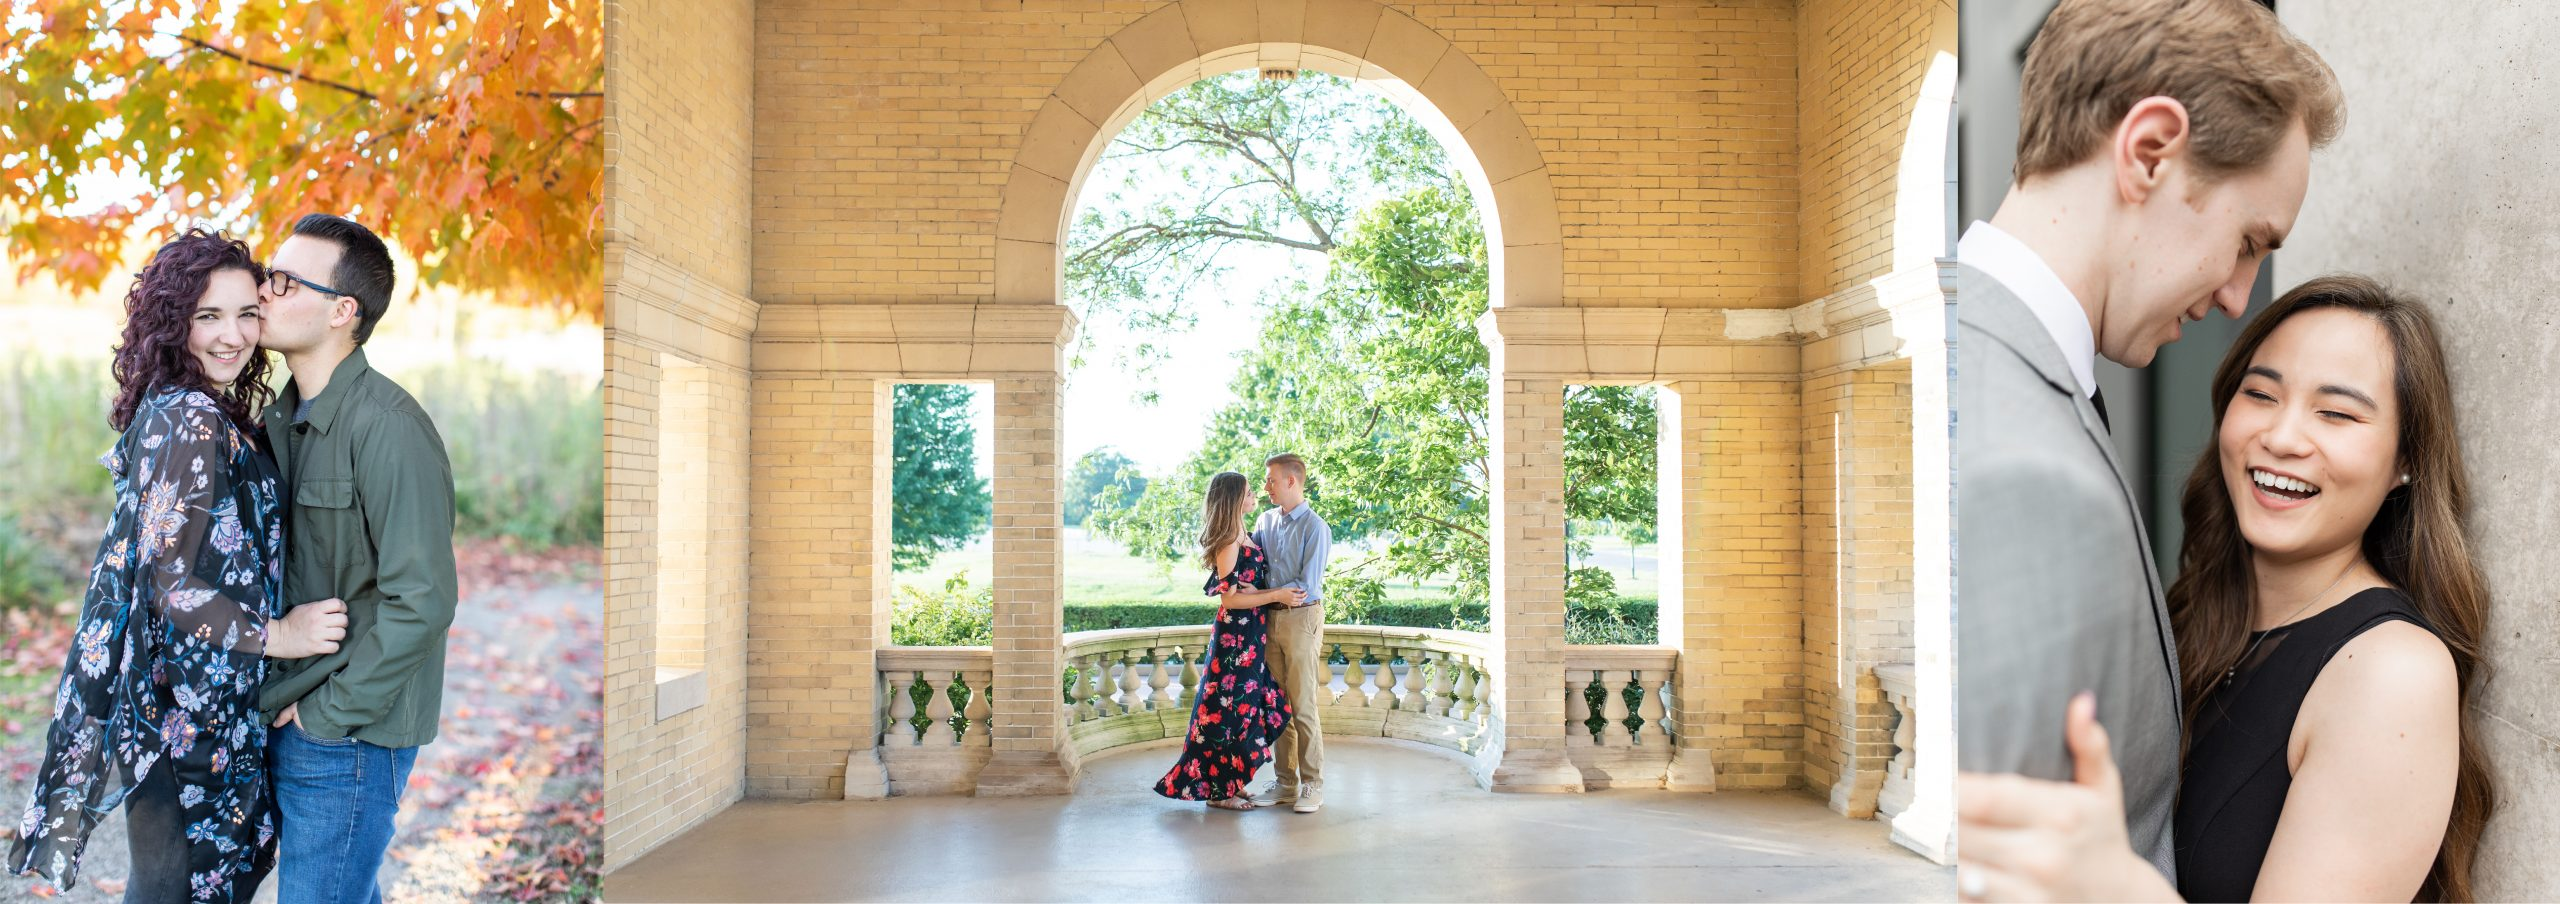 kandra-lynn-photography-wedding-photographer-04